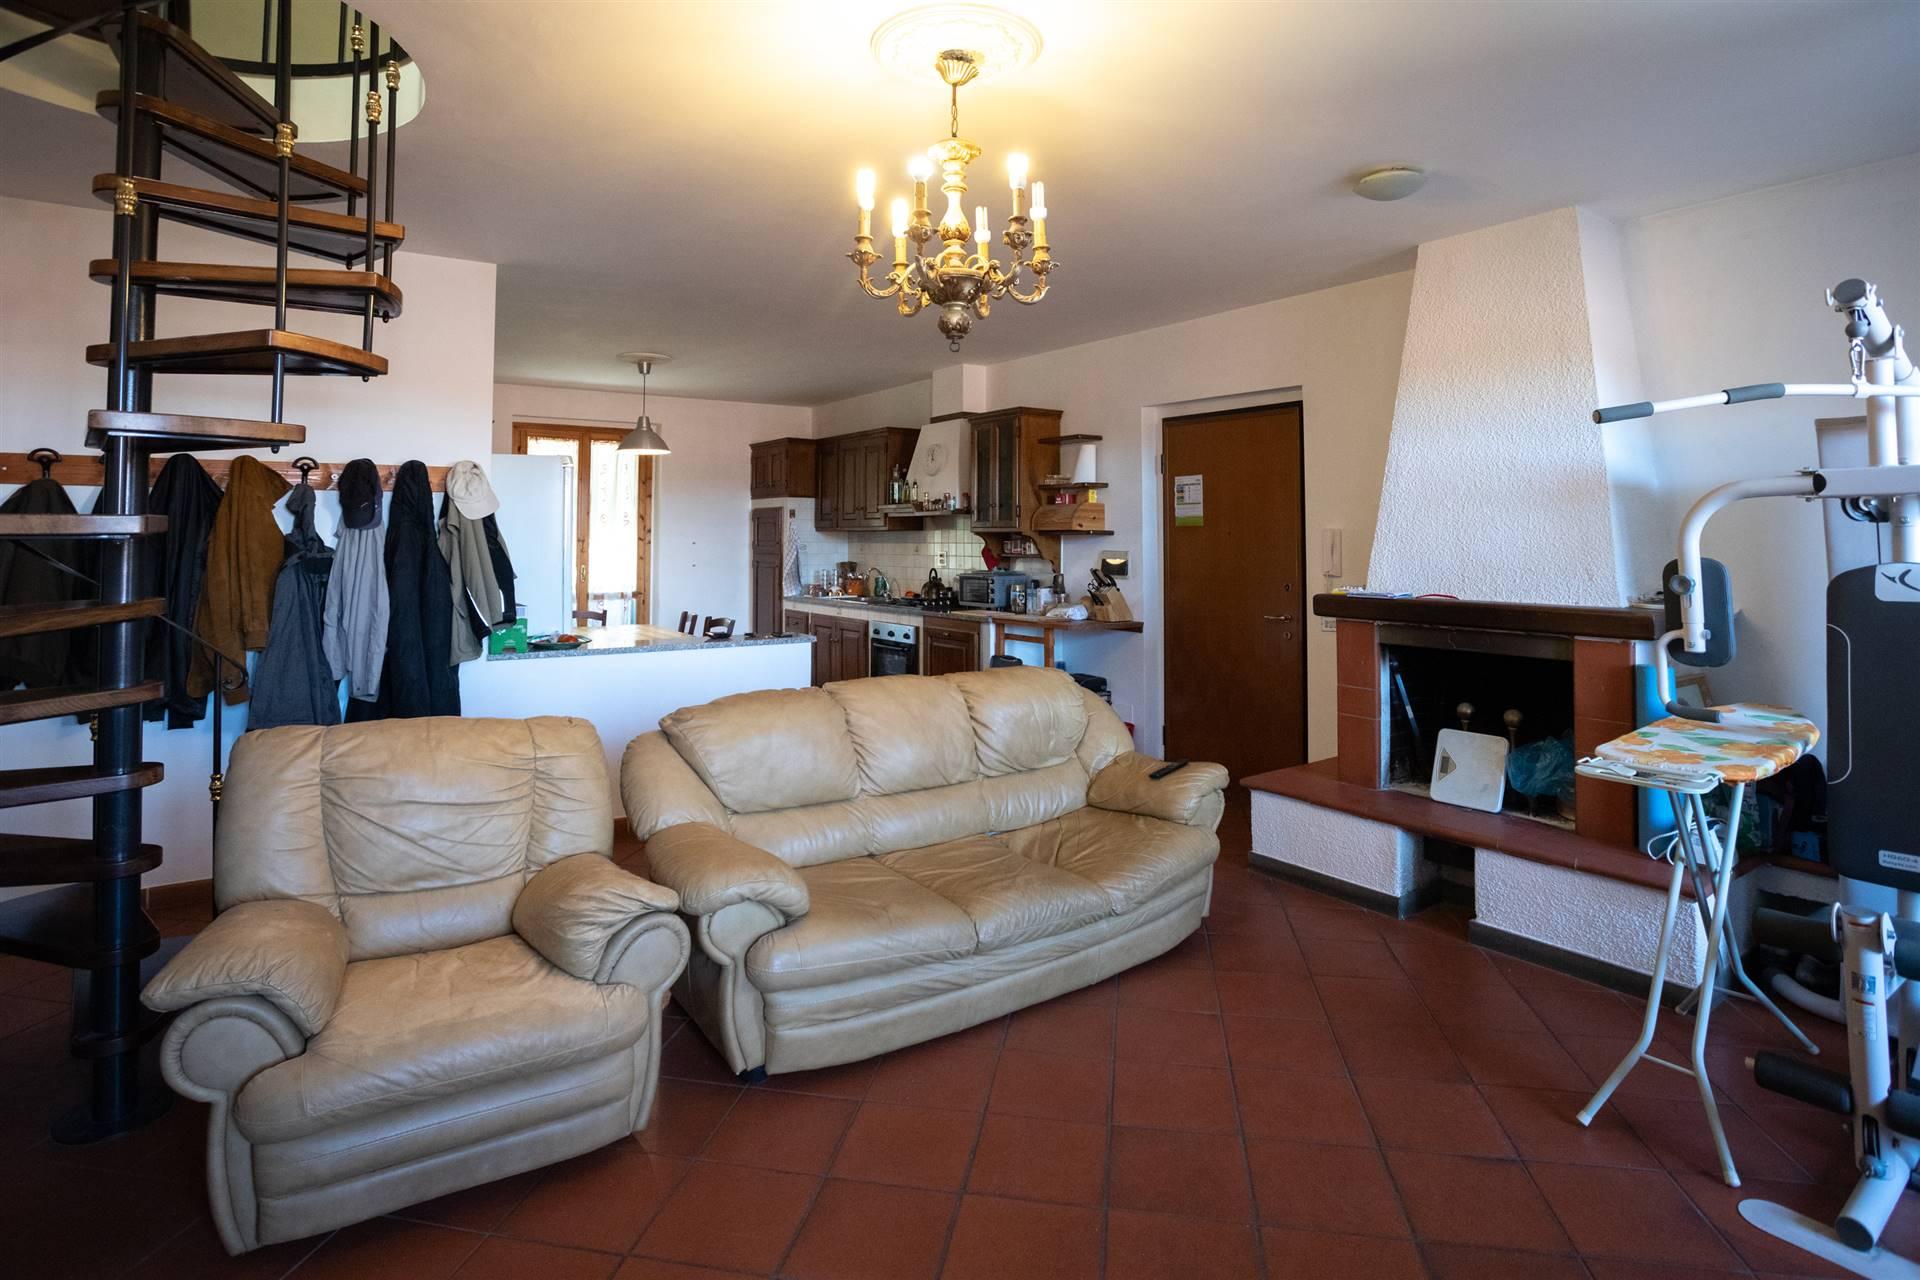 Appartamento residenziale in  vendita a BAGNOLO-CANTAGALLO › IMPRUNETA (FI)